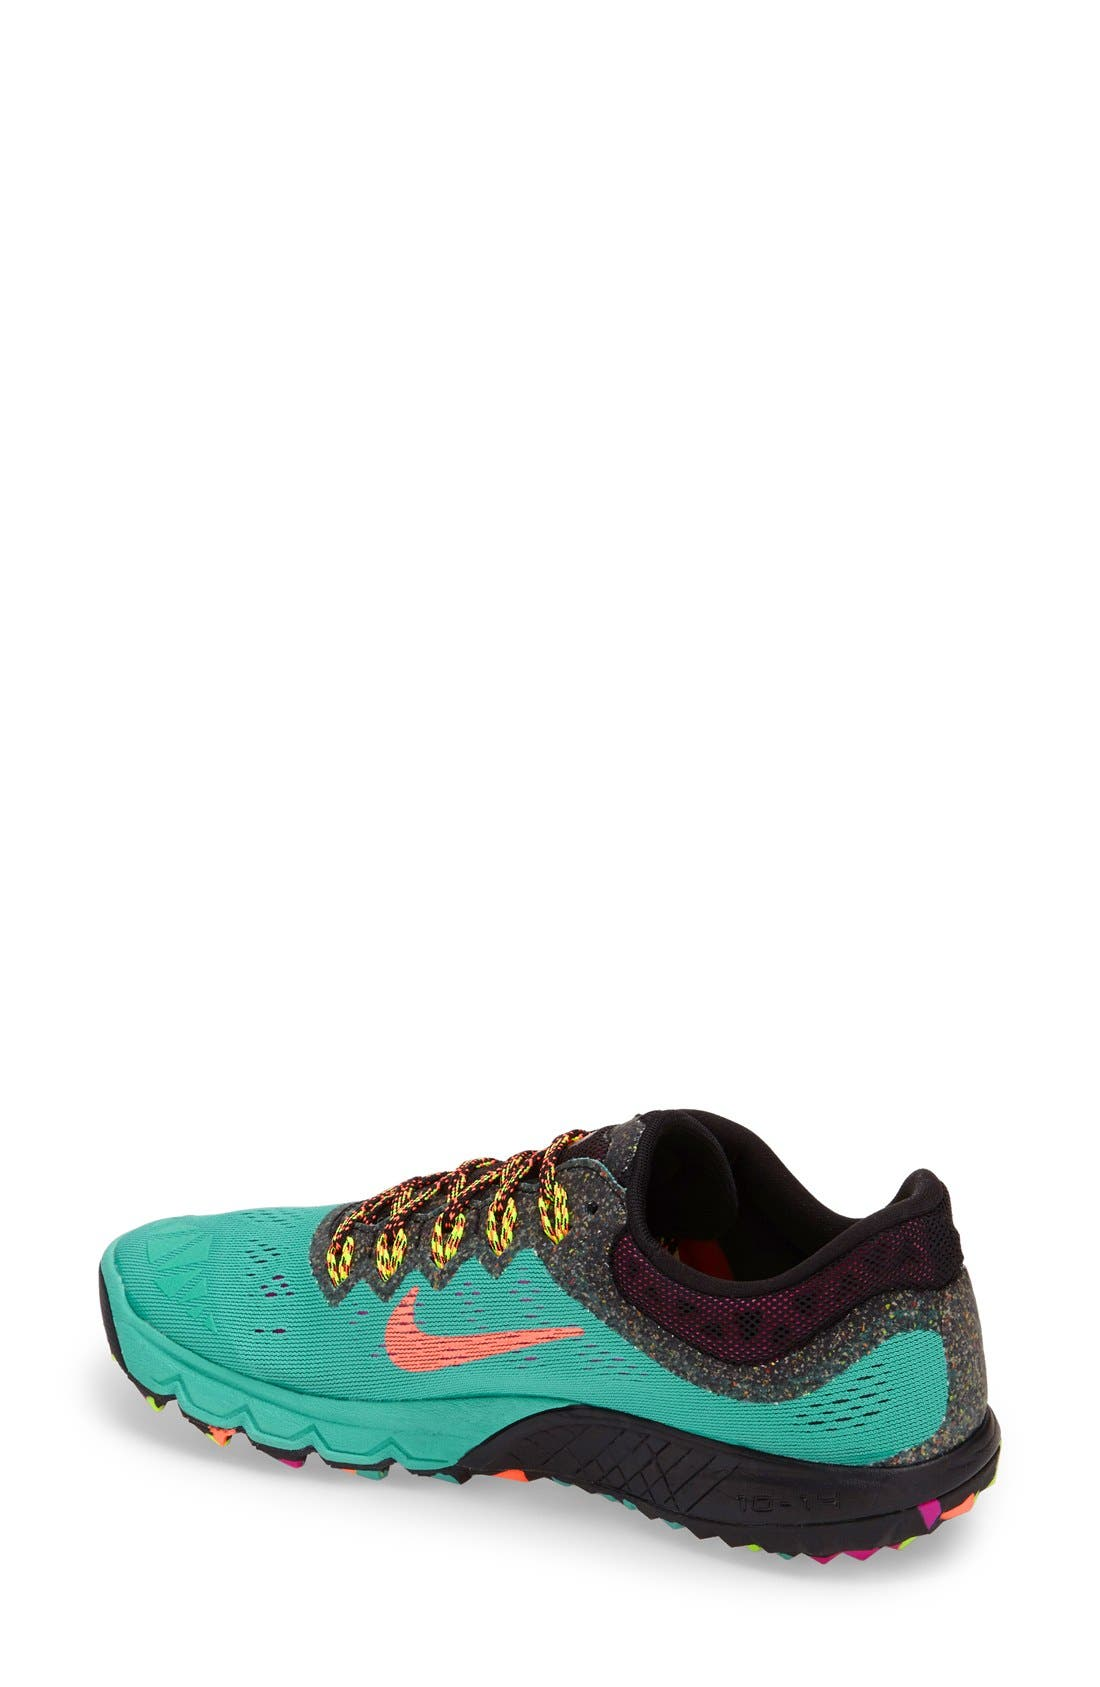 Alternate Image 2  - Nike 'Zoom Terra Kiger' Trail Running Shoe (Women)